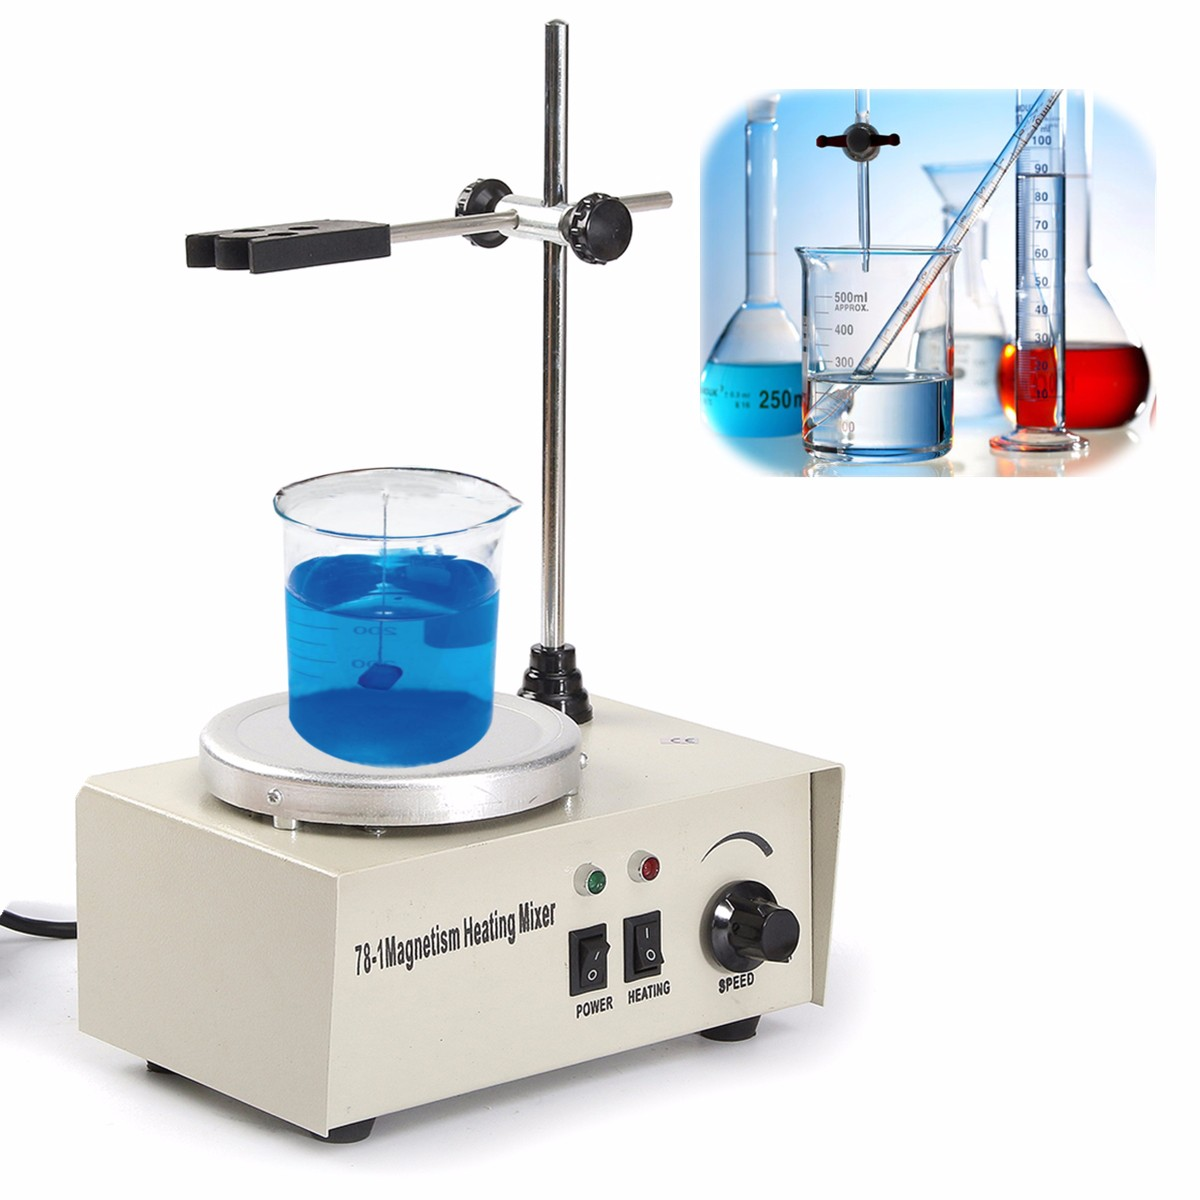 KiCute 1Set Laboratory Chemistry Magnetic Stirrer Magnetic Stirrer Home Laboratory Magnetic Mixer Stirrers Apparatus 220V 50HZ цена